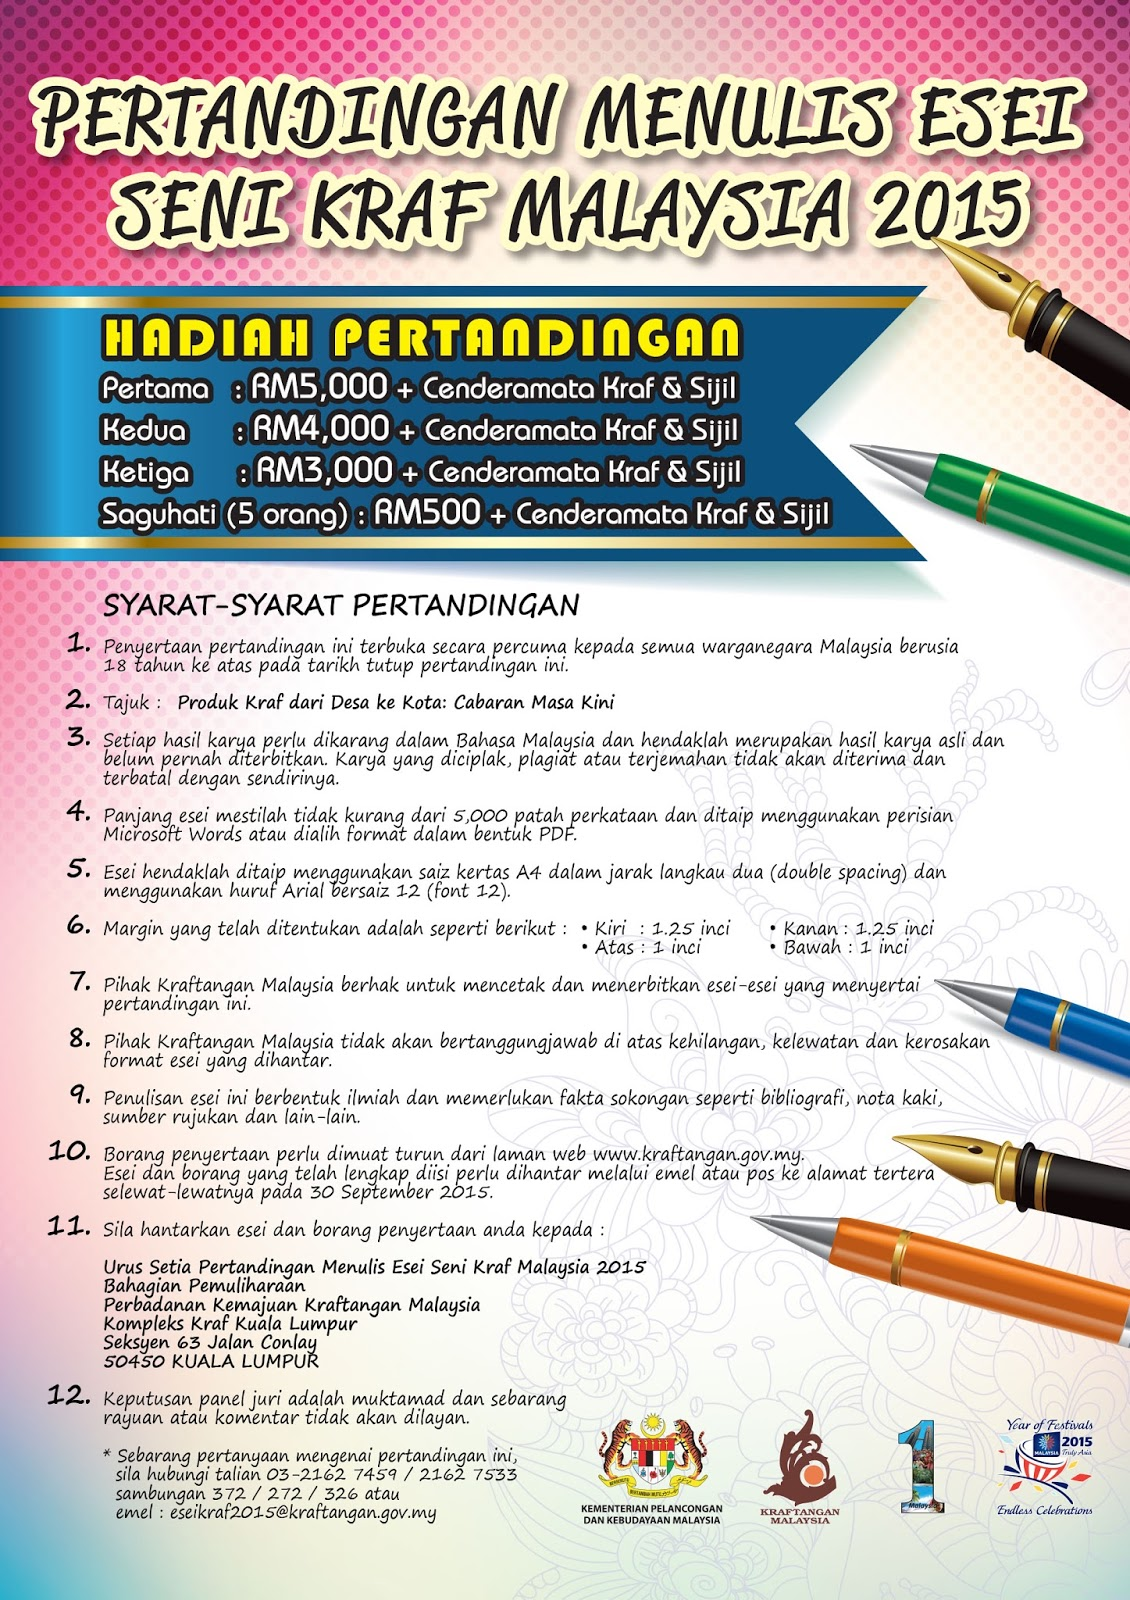 Pertandingan Menulis Essei Seni Kraf Malaysia